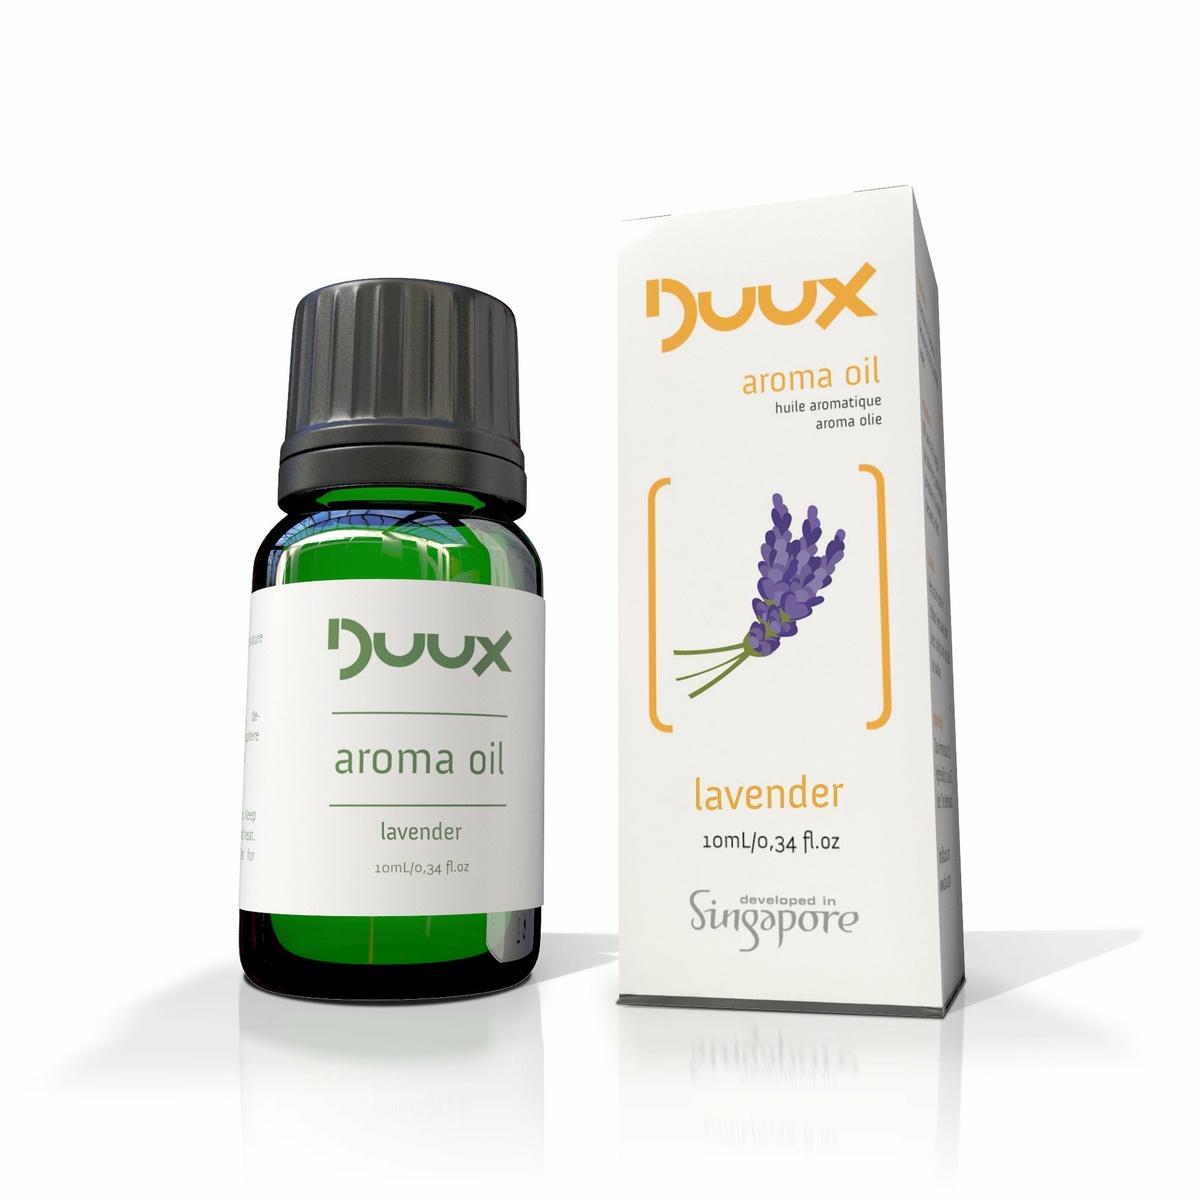 Maxxo Duux aróma olej Levander - pre čističku,